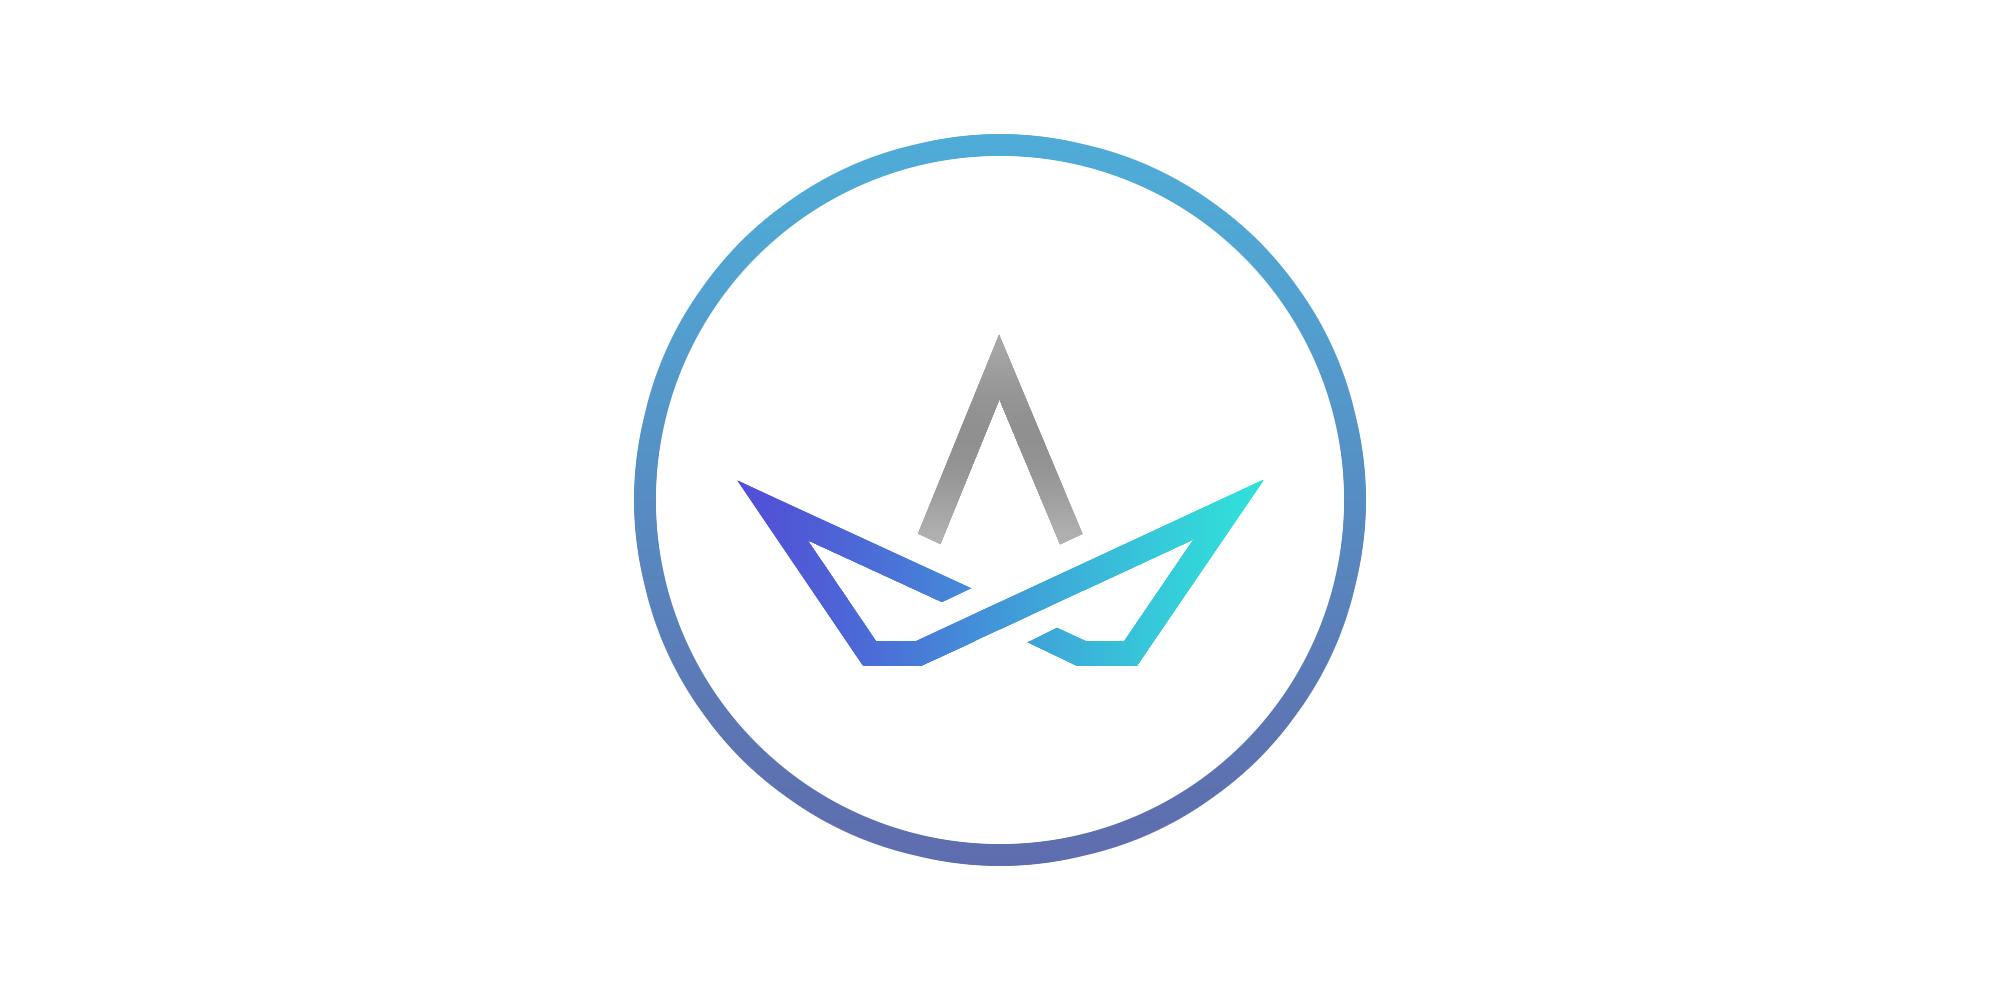 https://jaringansuaraindonesia.com/wp-content/plugins/kingcomposer/assets/images/get_start.jpg